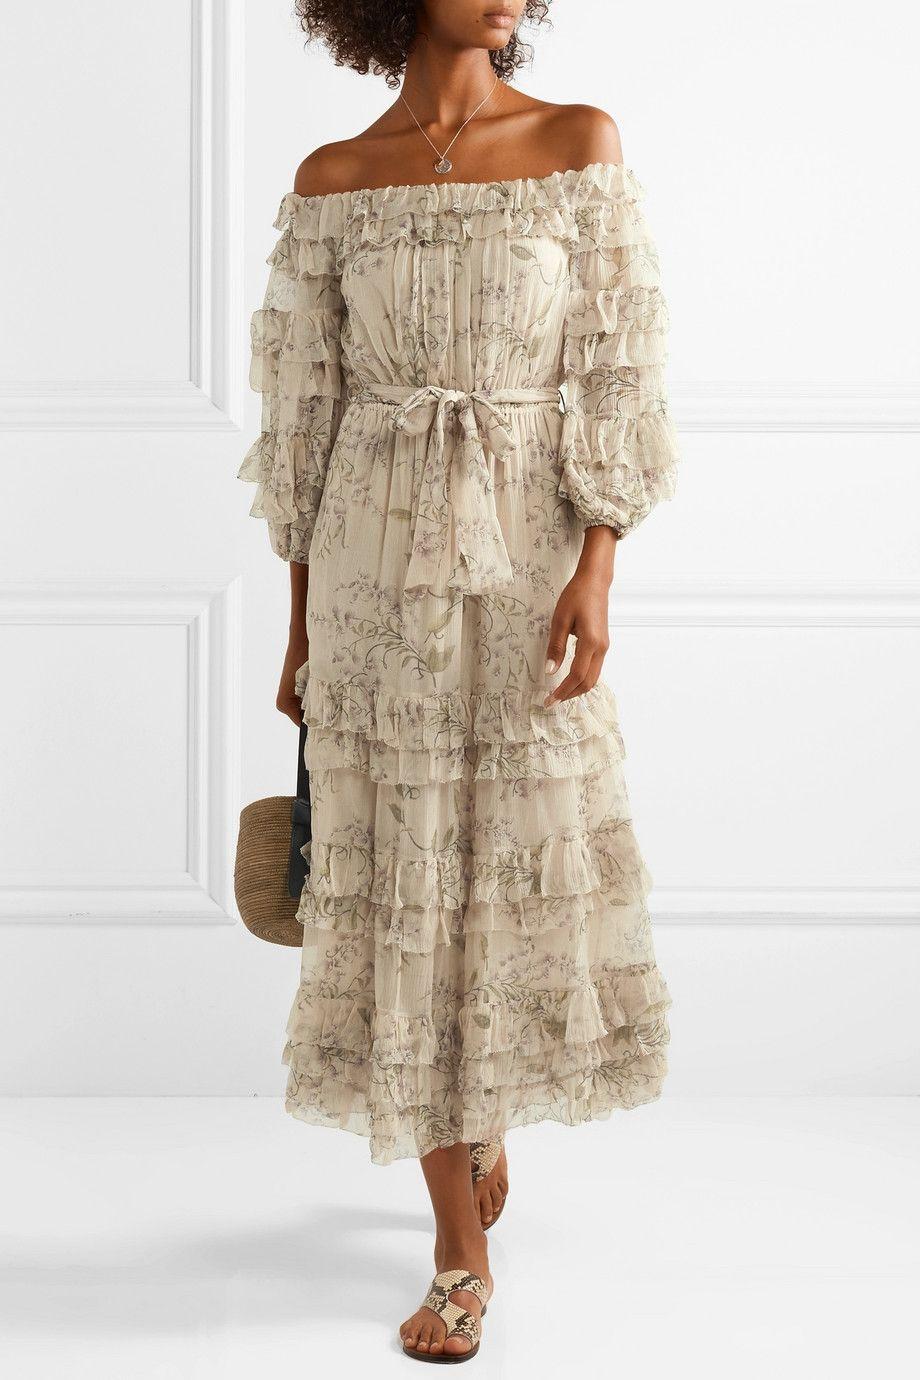 c107f1be88e617 Zimmermann | Unbridled off-the-shoulder printed silk-chiffon midi dress |  NET-A-PORTER.COM